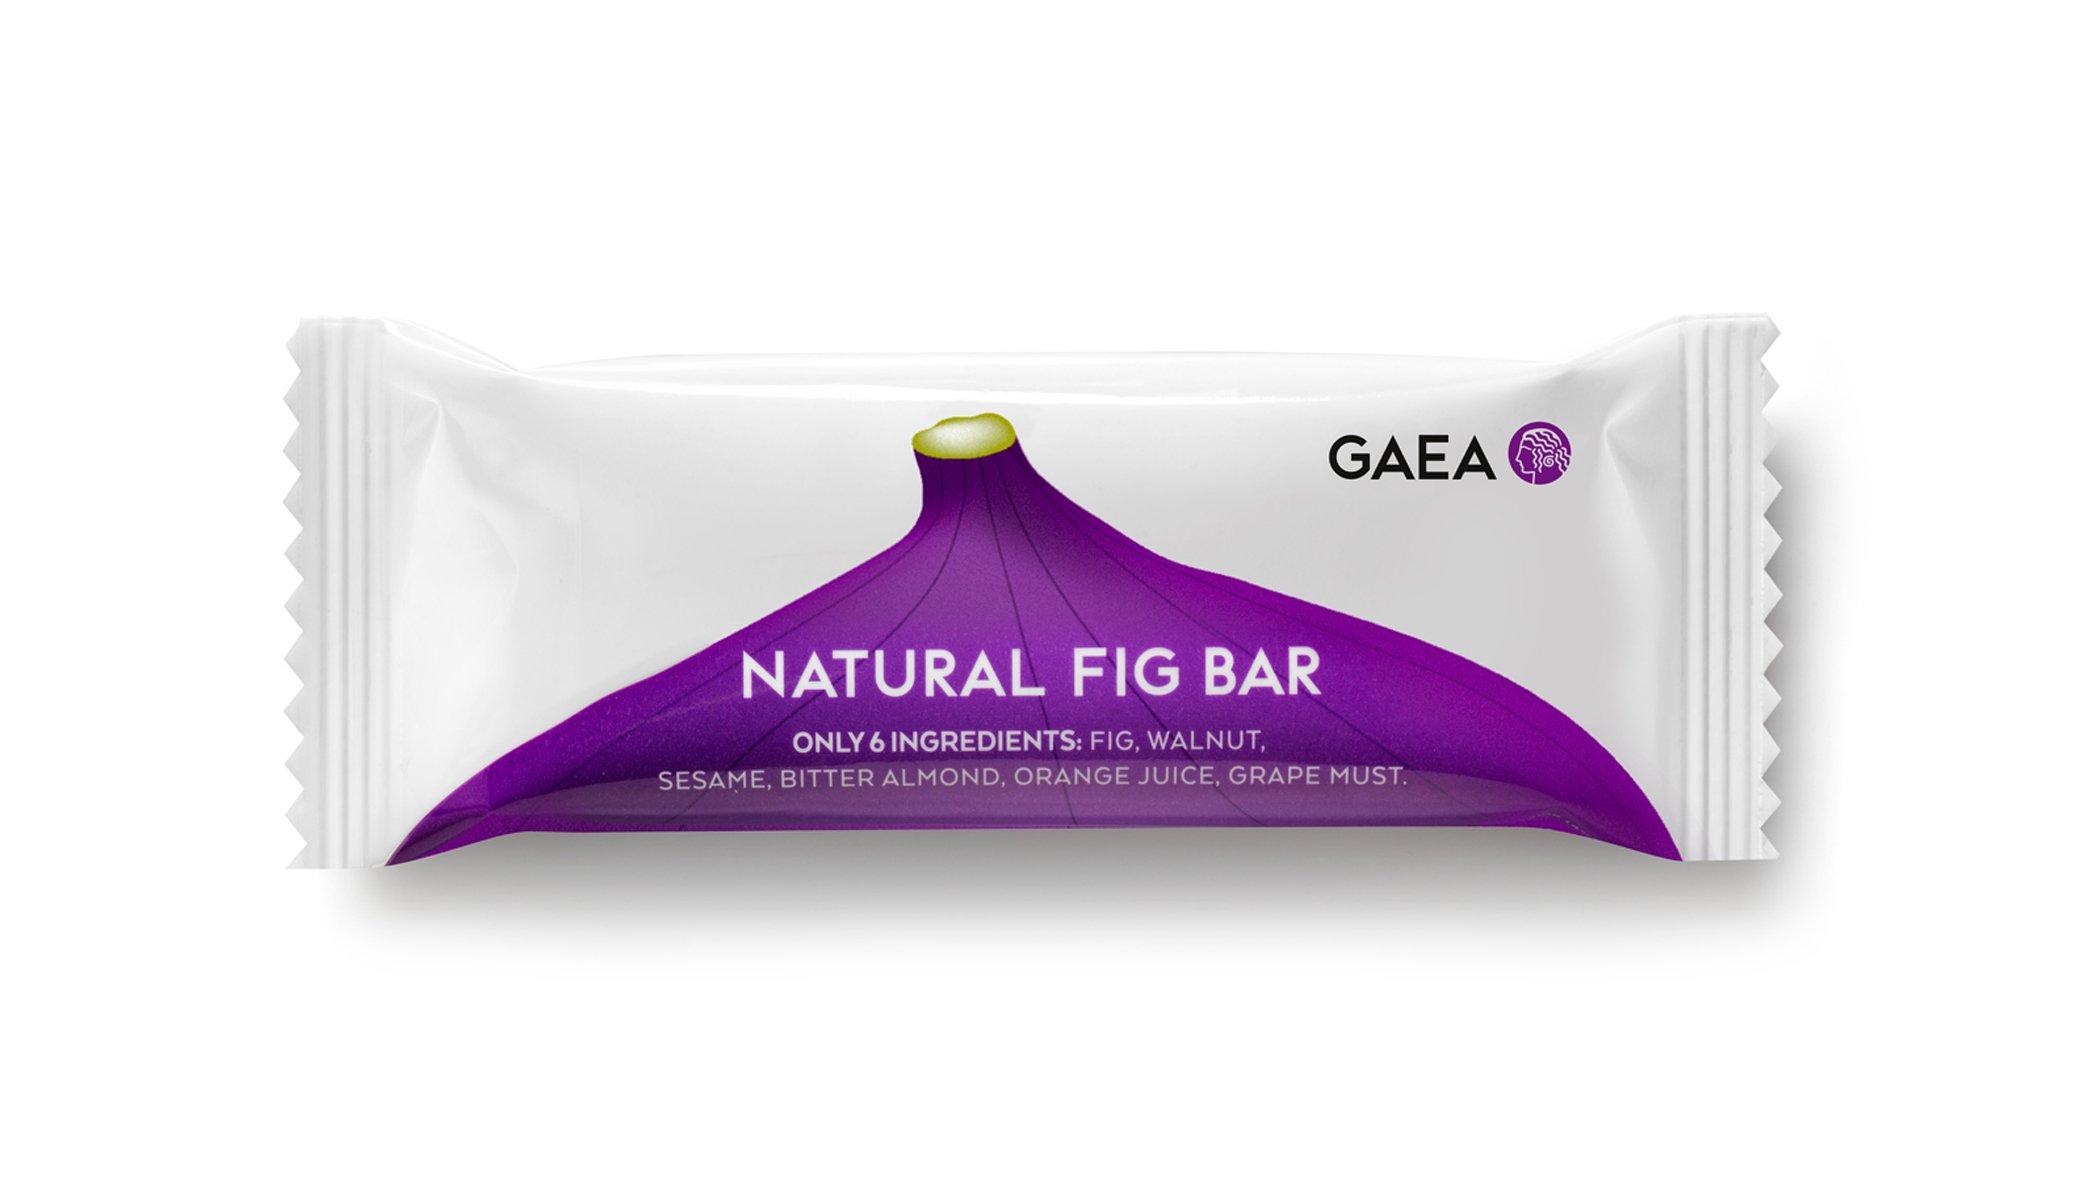 Gaea bar packaging